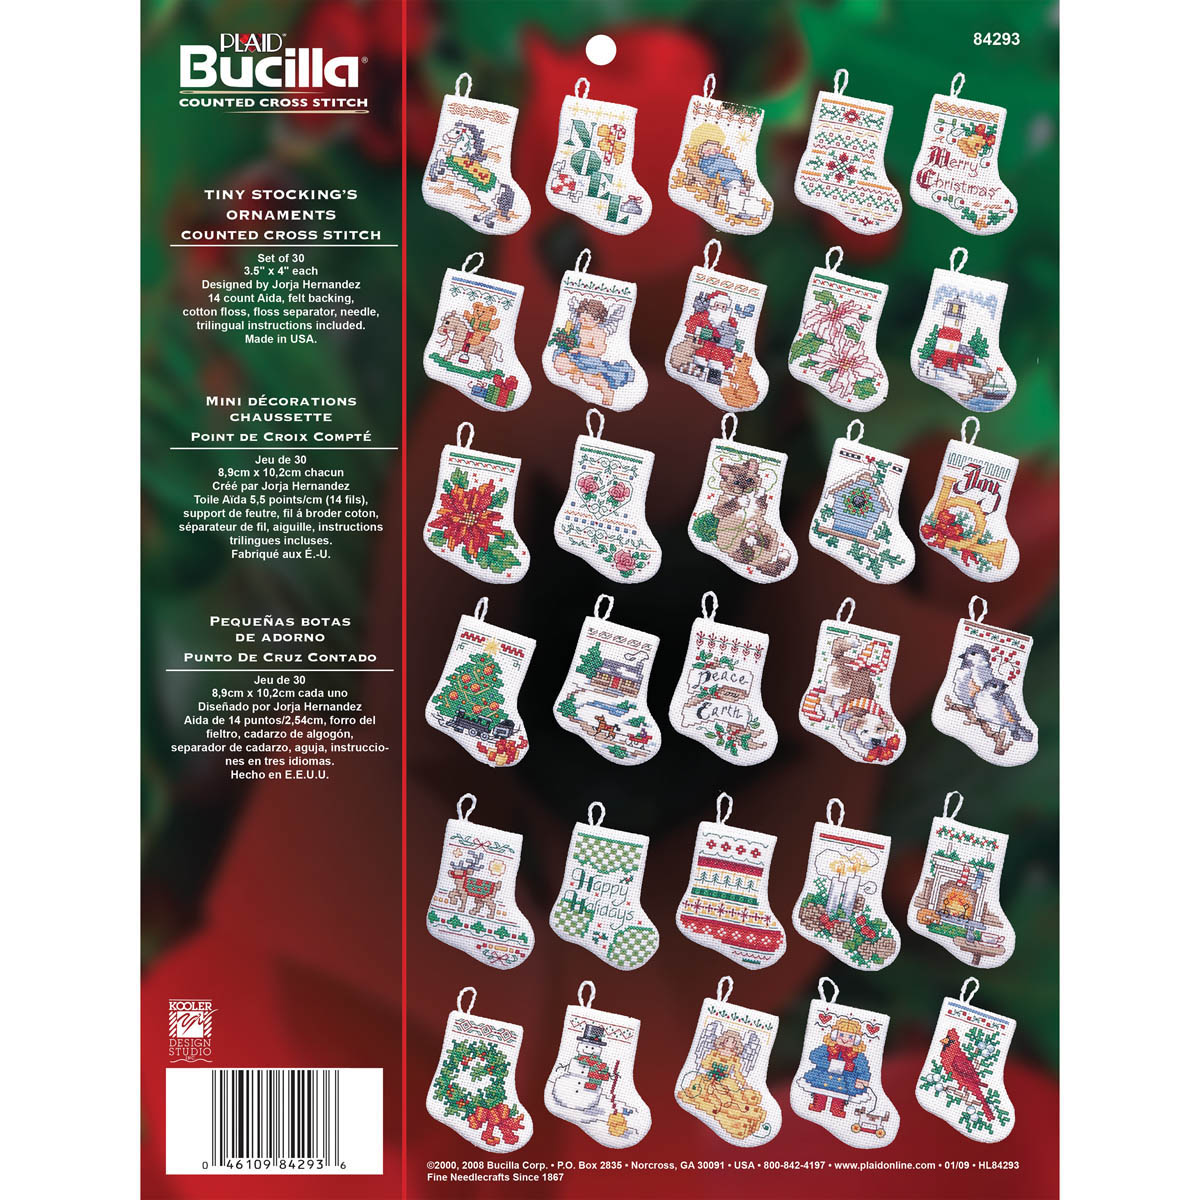 Bucilla ® Seasonal - Counted Cross Stitch - Ornament Kits - Tiny Stockings - 84293